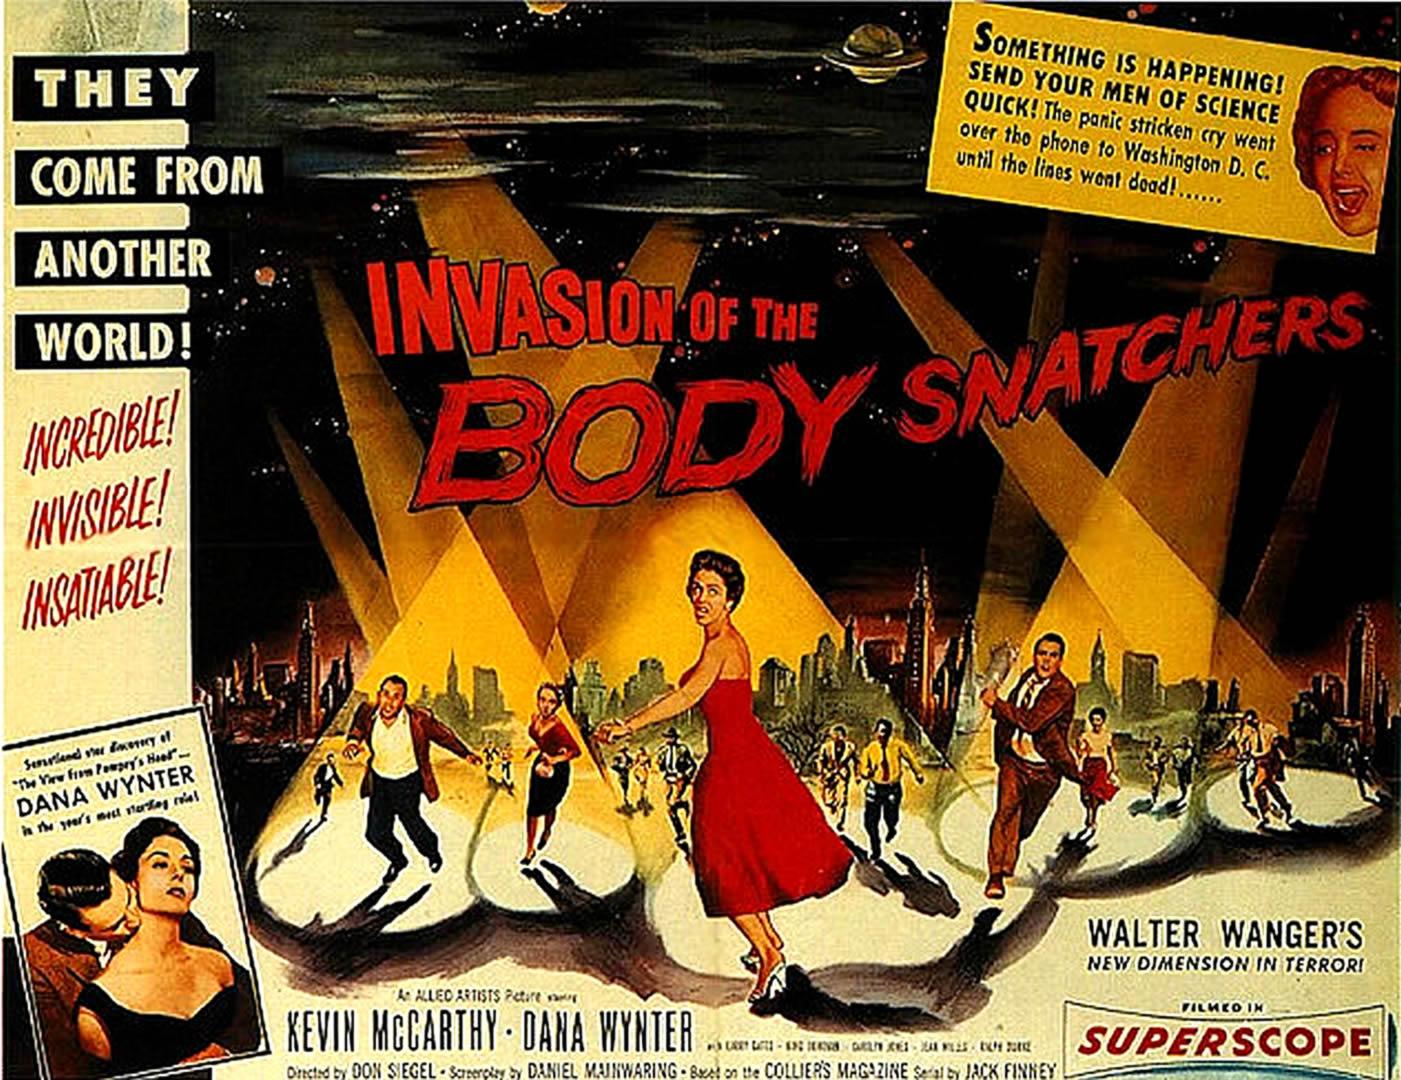 Best 40 Invasion of the Body Snatchers Wallpaper on HipWallpaper 1401x1080